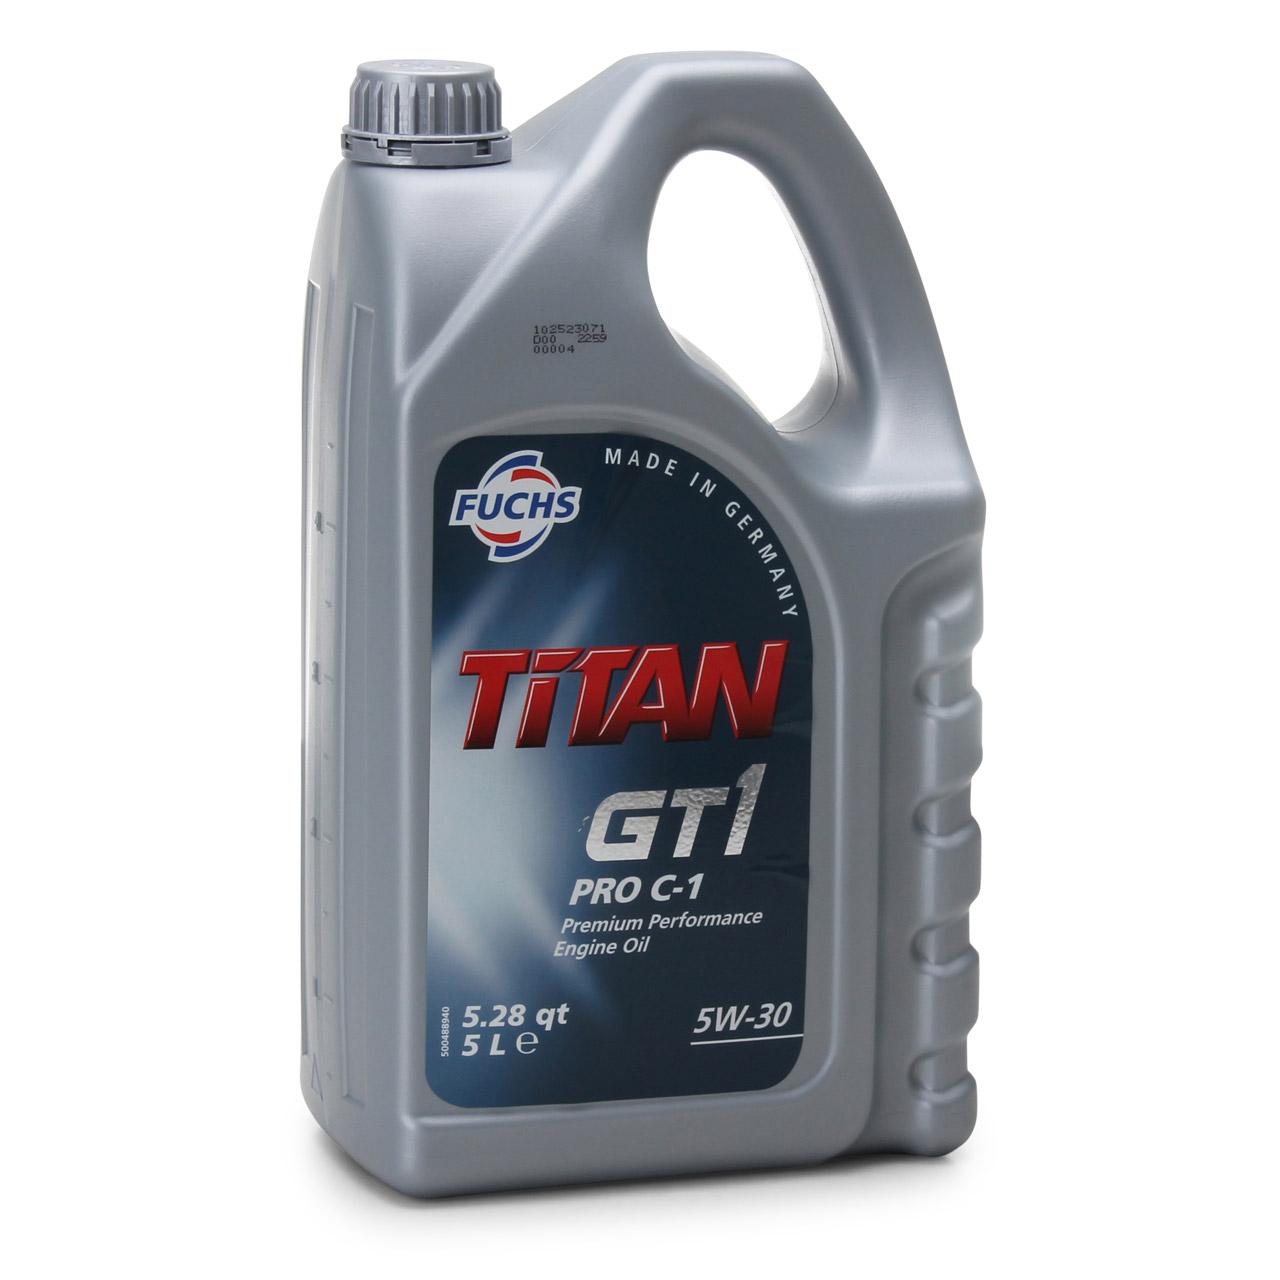 FUCHS Öl Motoröl TITAN GT1 PRO C-1 5W30 5L 5 Liter für FORD JAGUAR LAND ROVER